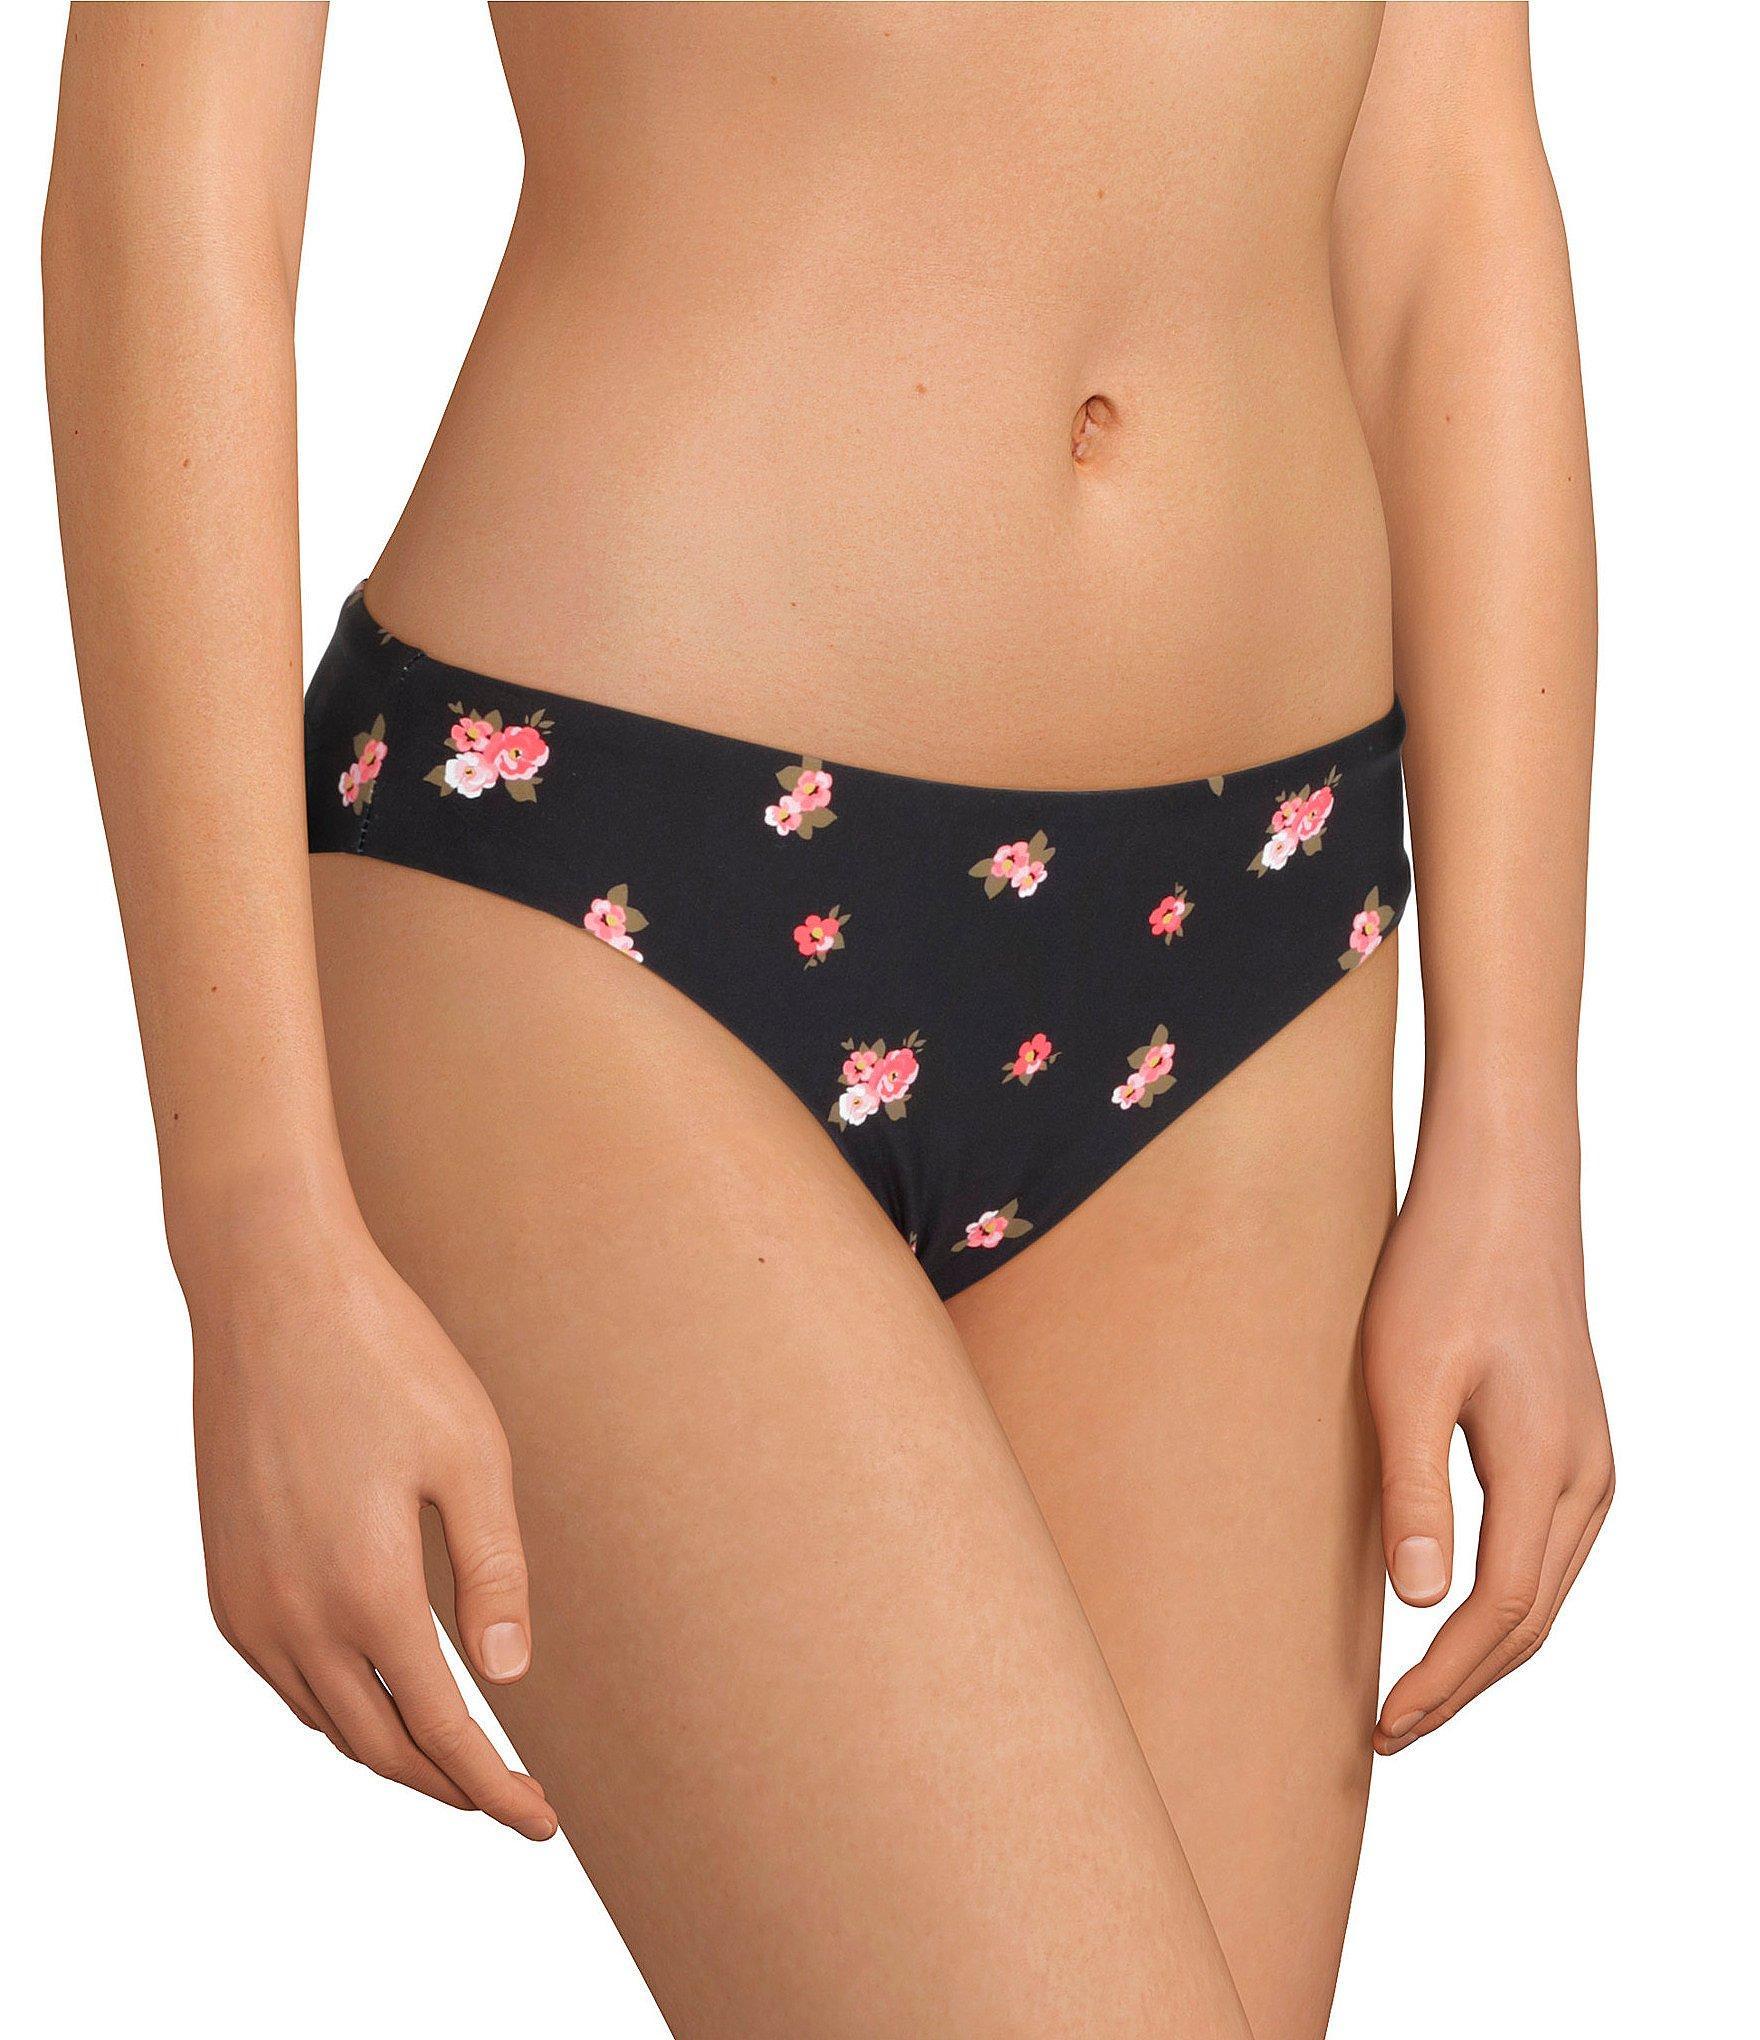 a207e5a813 Lyst - Gianni Bini Celestial Garden Classic Swimsuit Bottom in Black